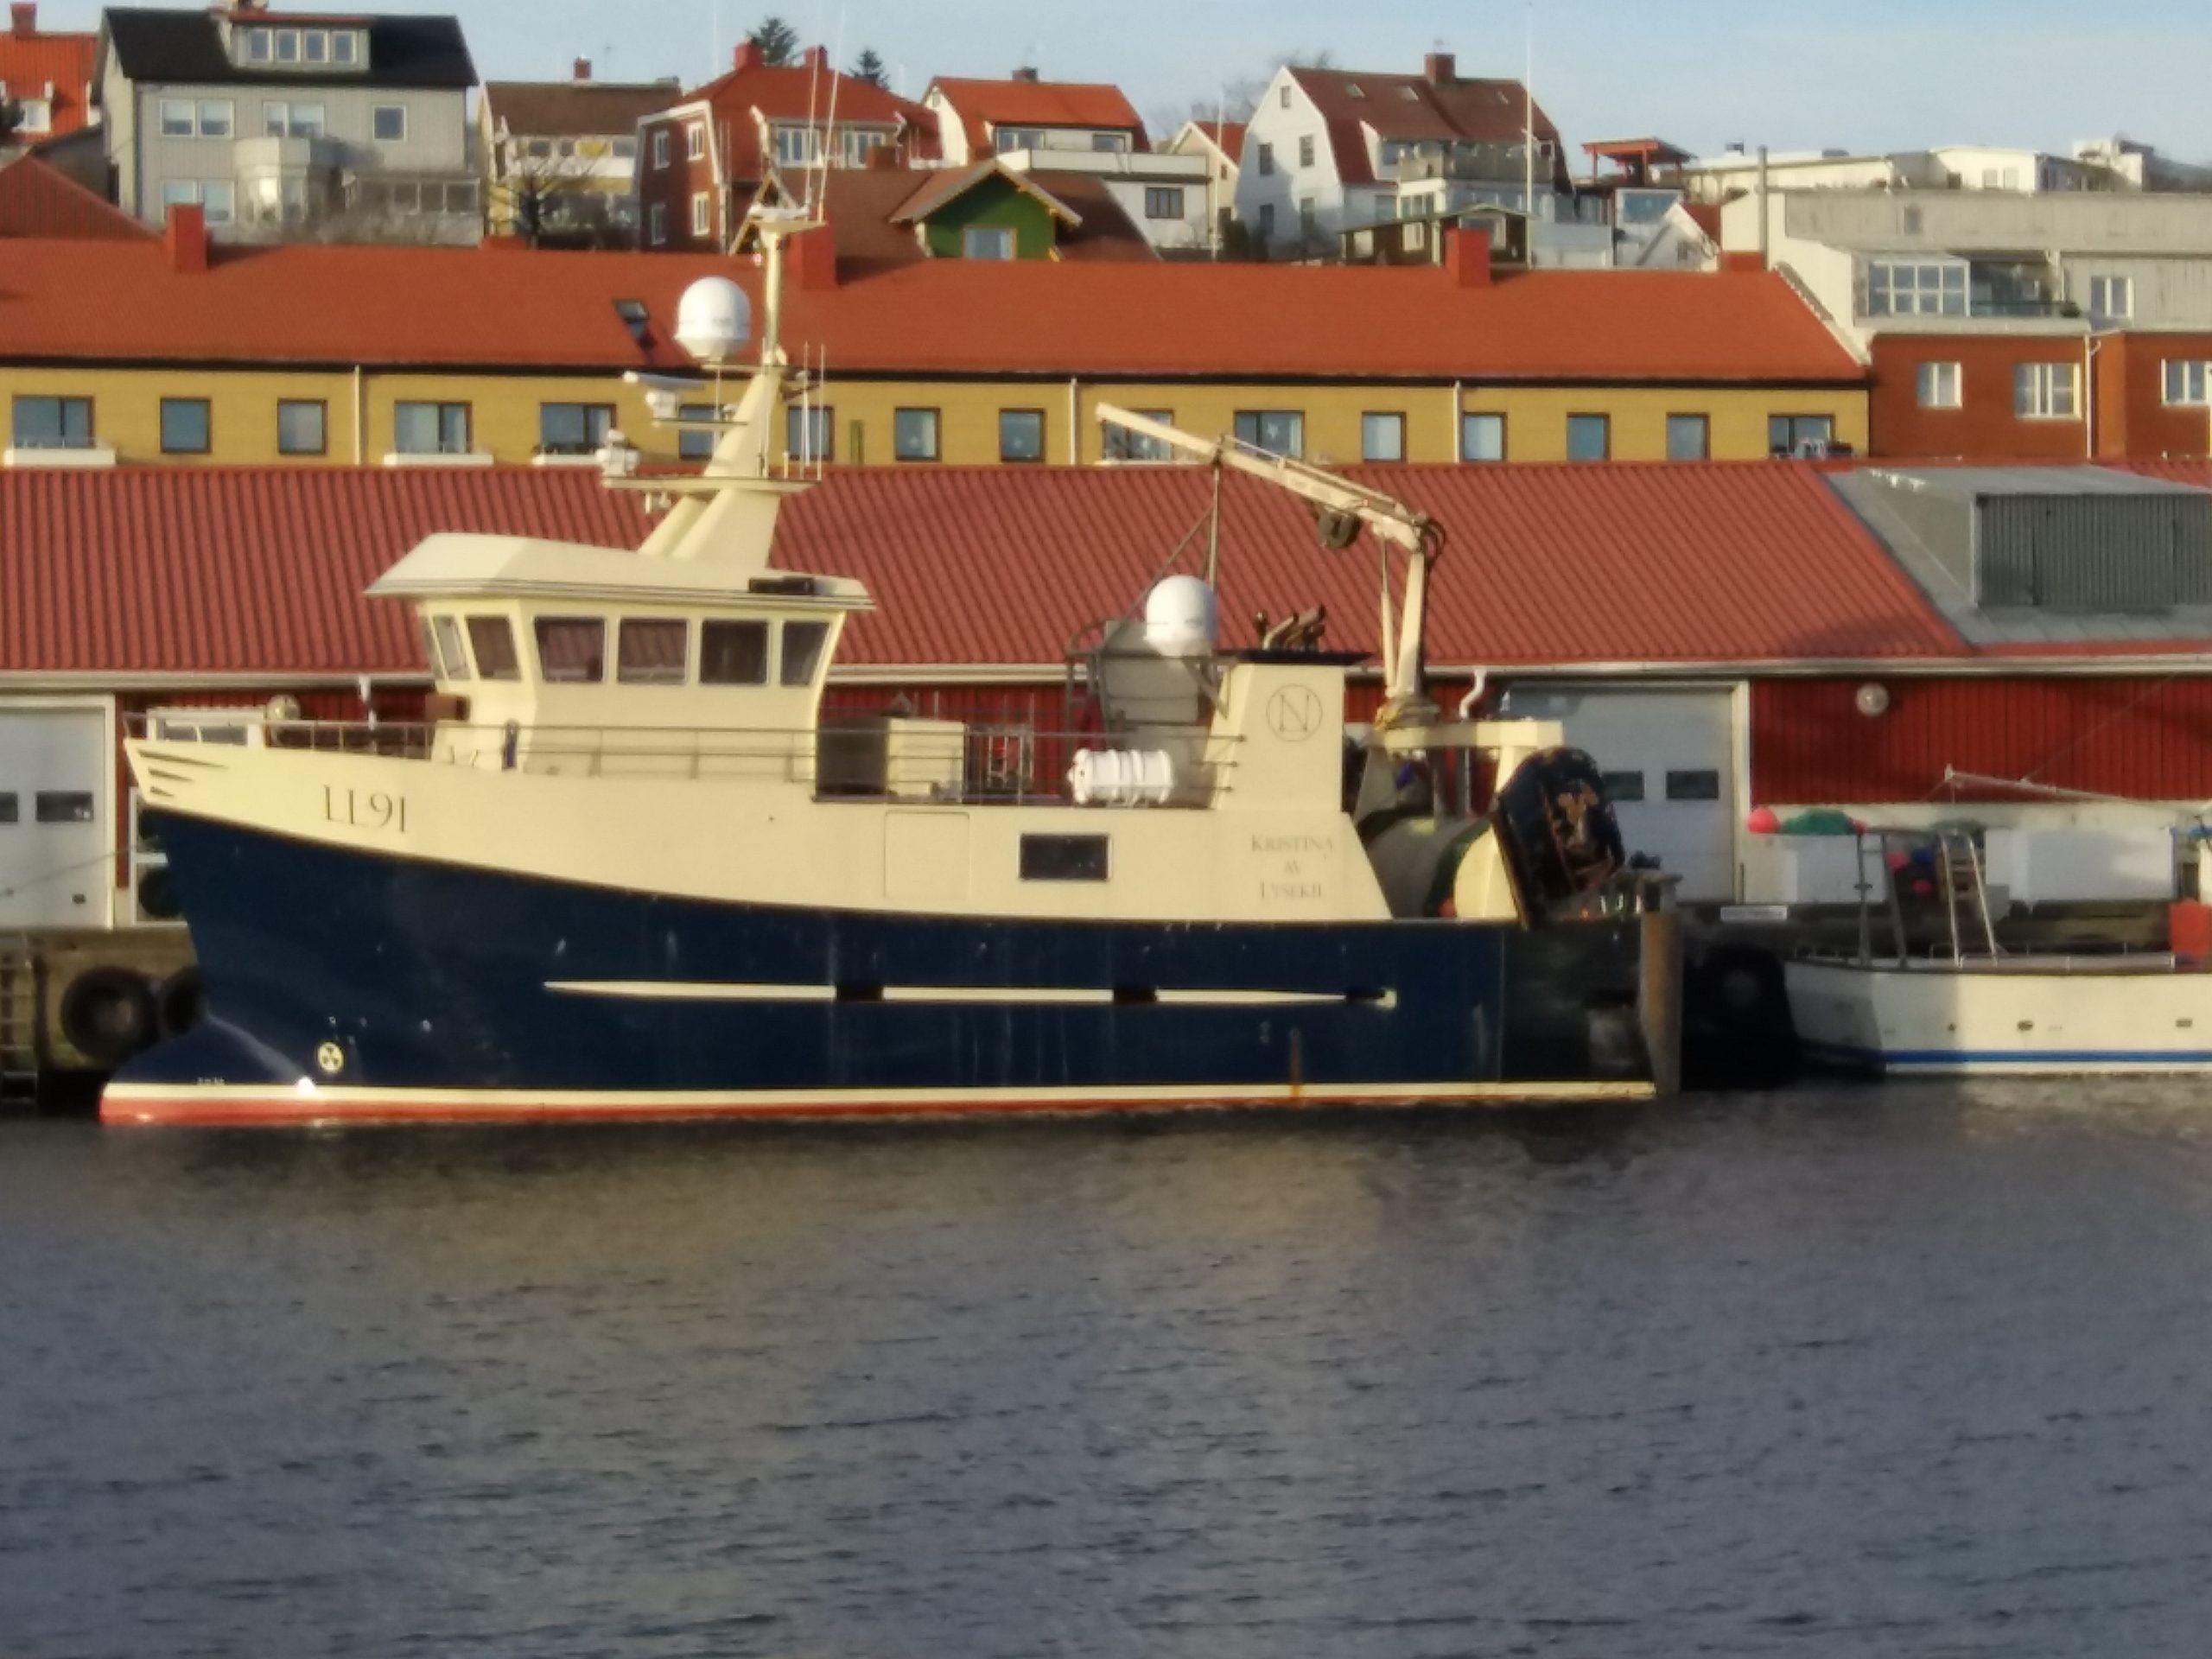 LL91 Kristina i hamn